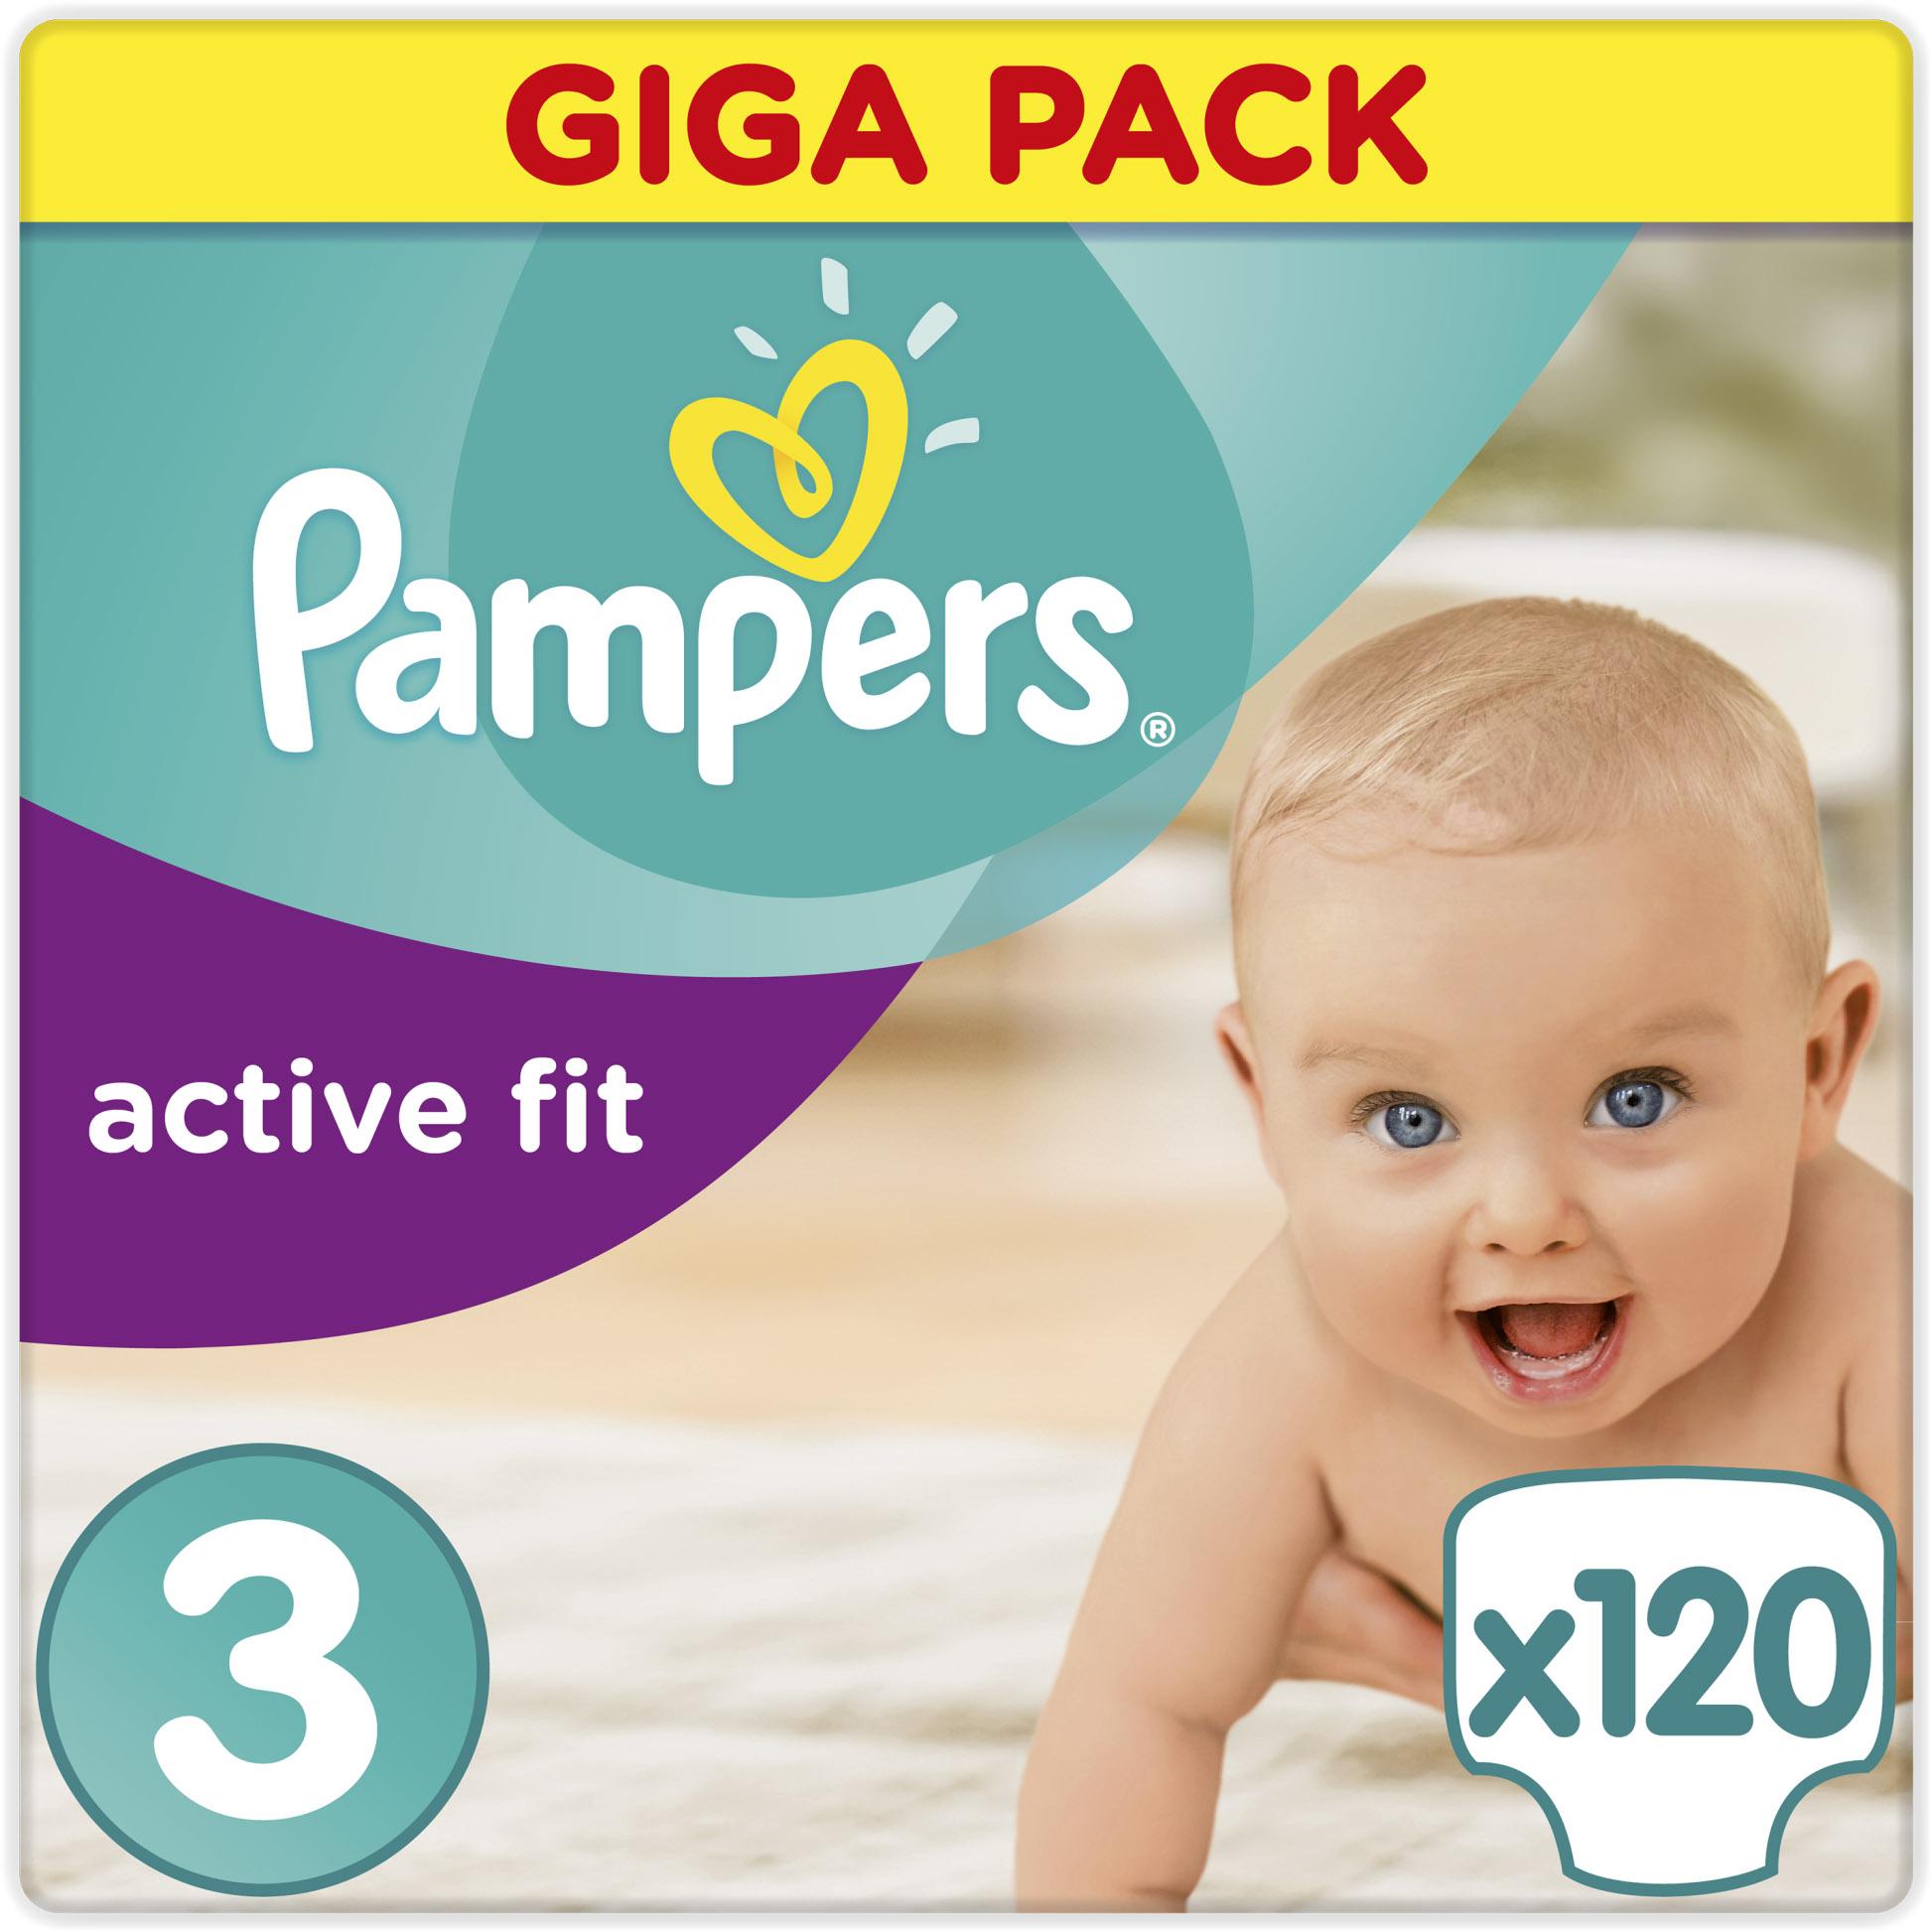 Pampers Active Fit Giga Pack No3 Midi (5-9kg), 120 πάνες μητέρα παιδί   περιποίηση για το μωρό   πάνες για το μωρό